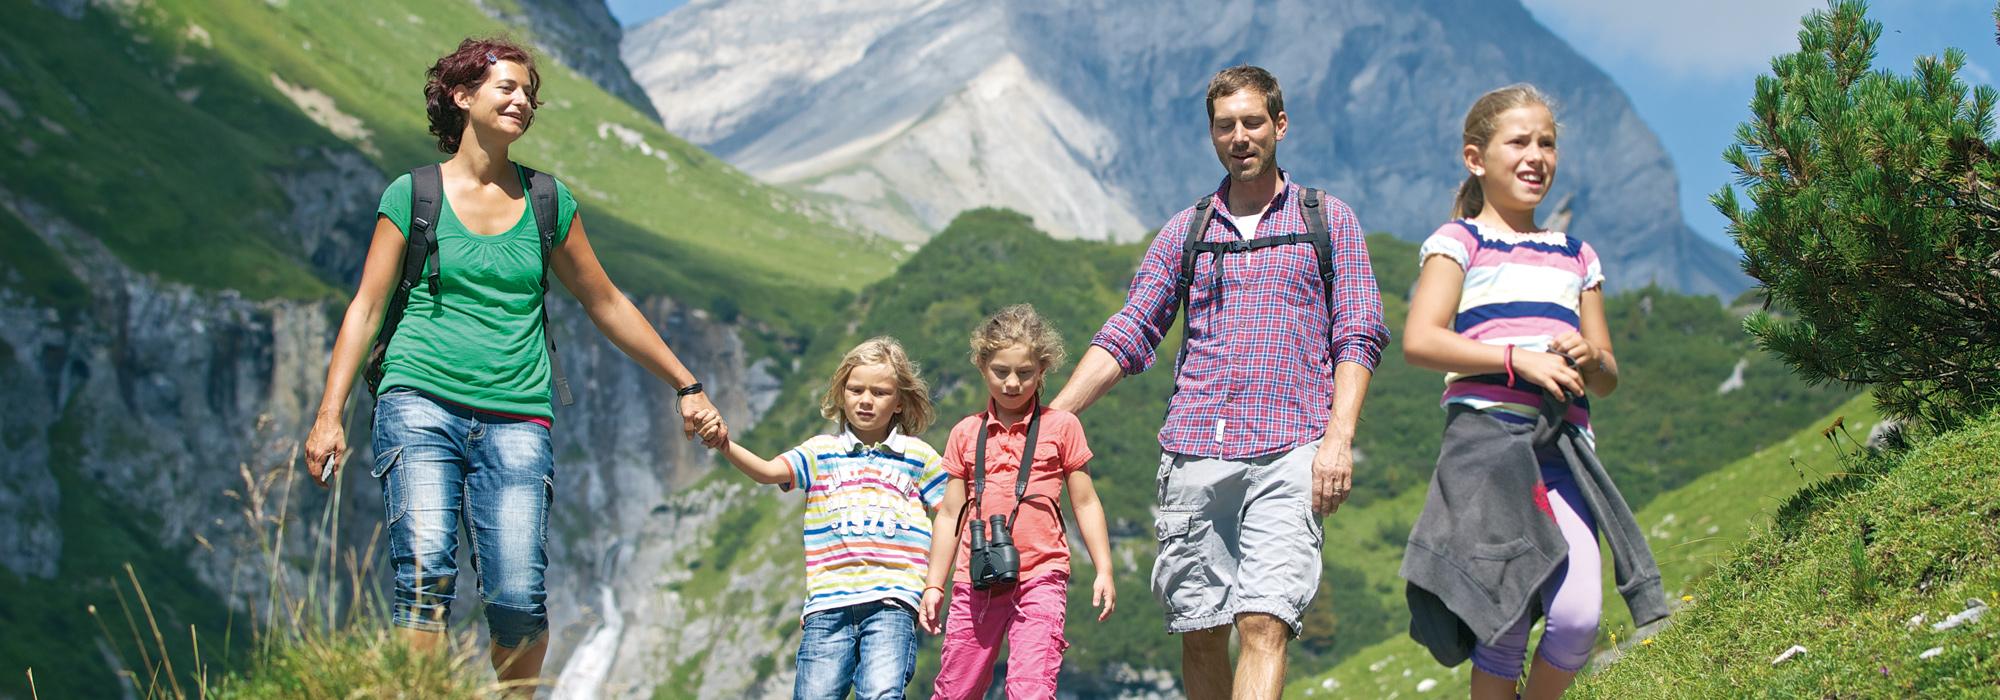 Wandern Flims Familie mit Kinder